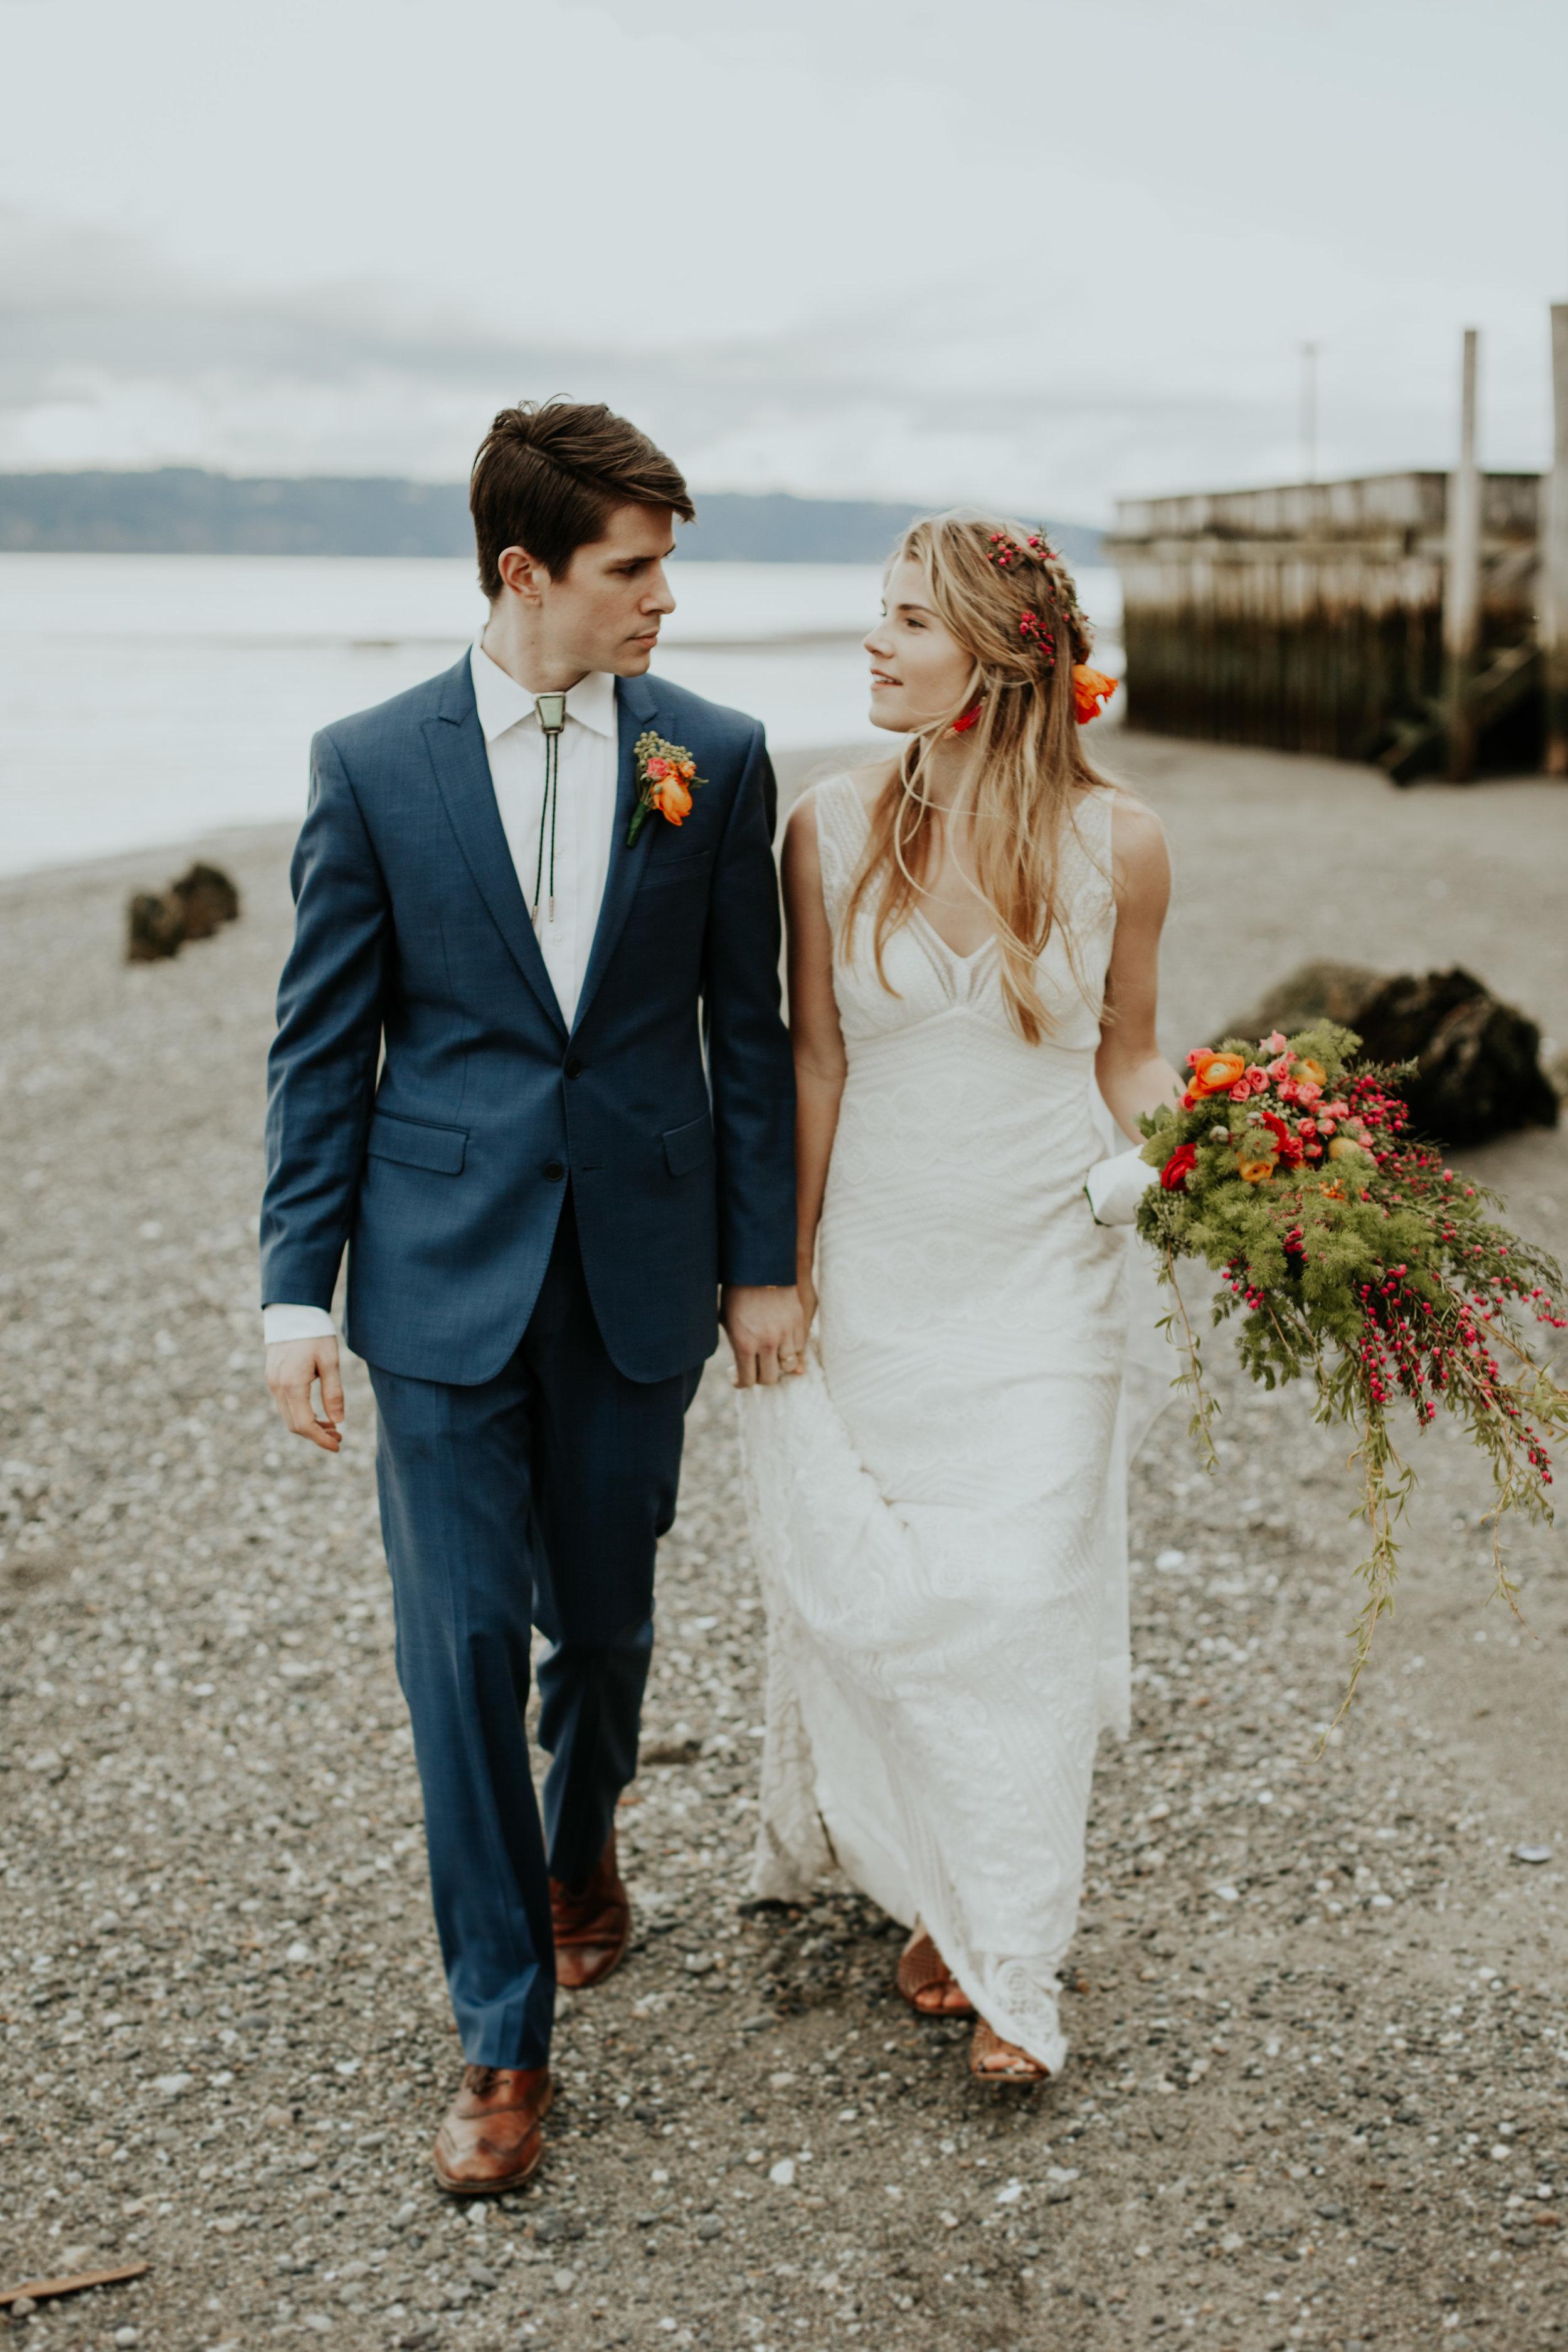 Erika & Steven - STYLED WEDDING